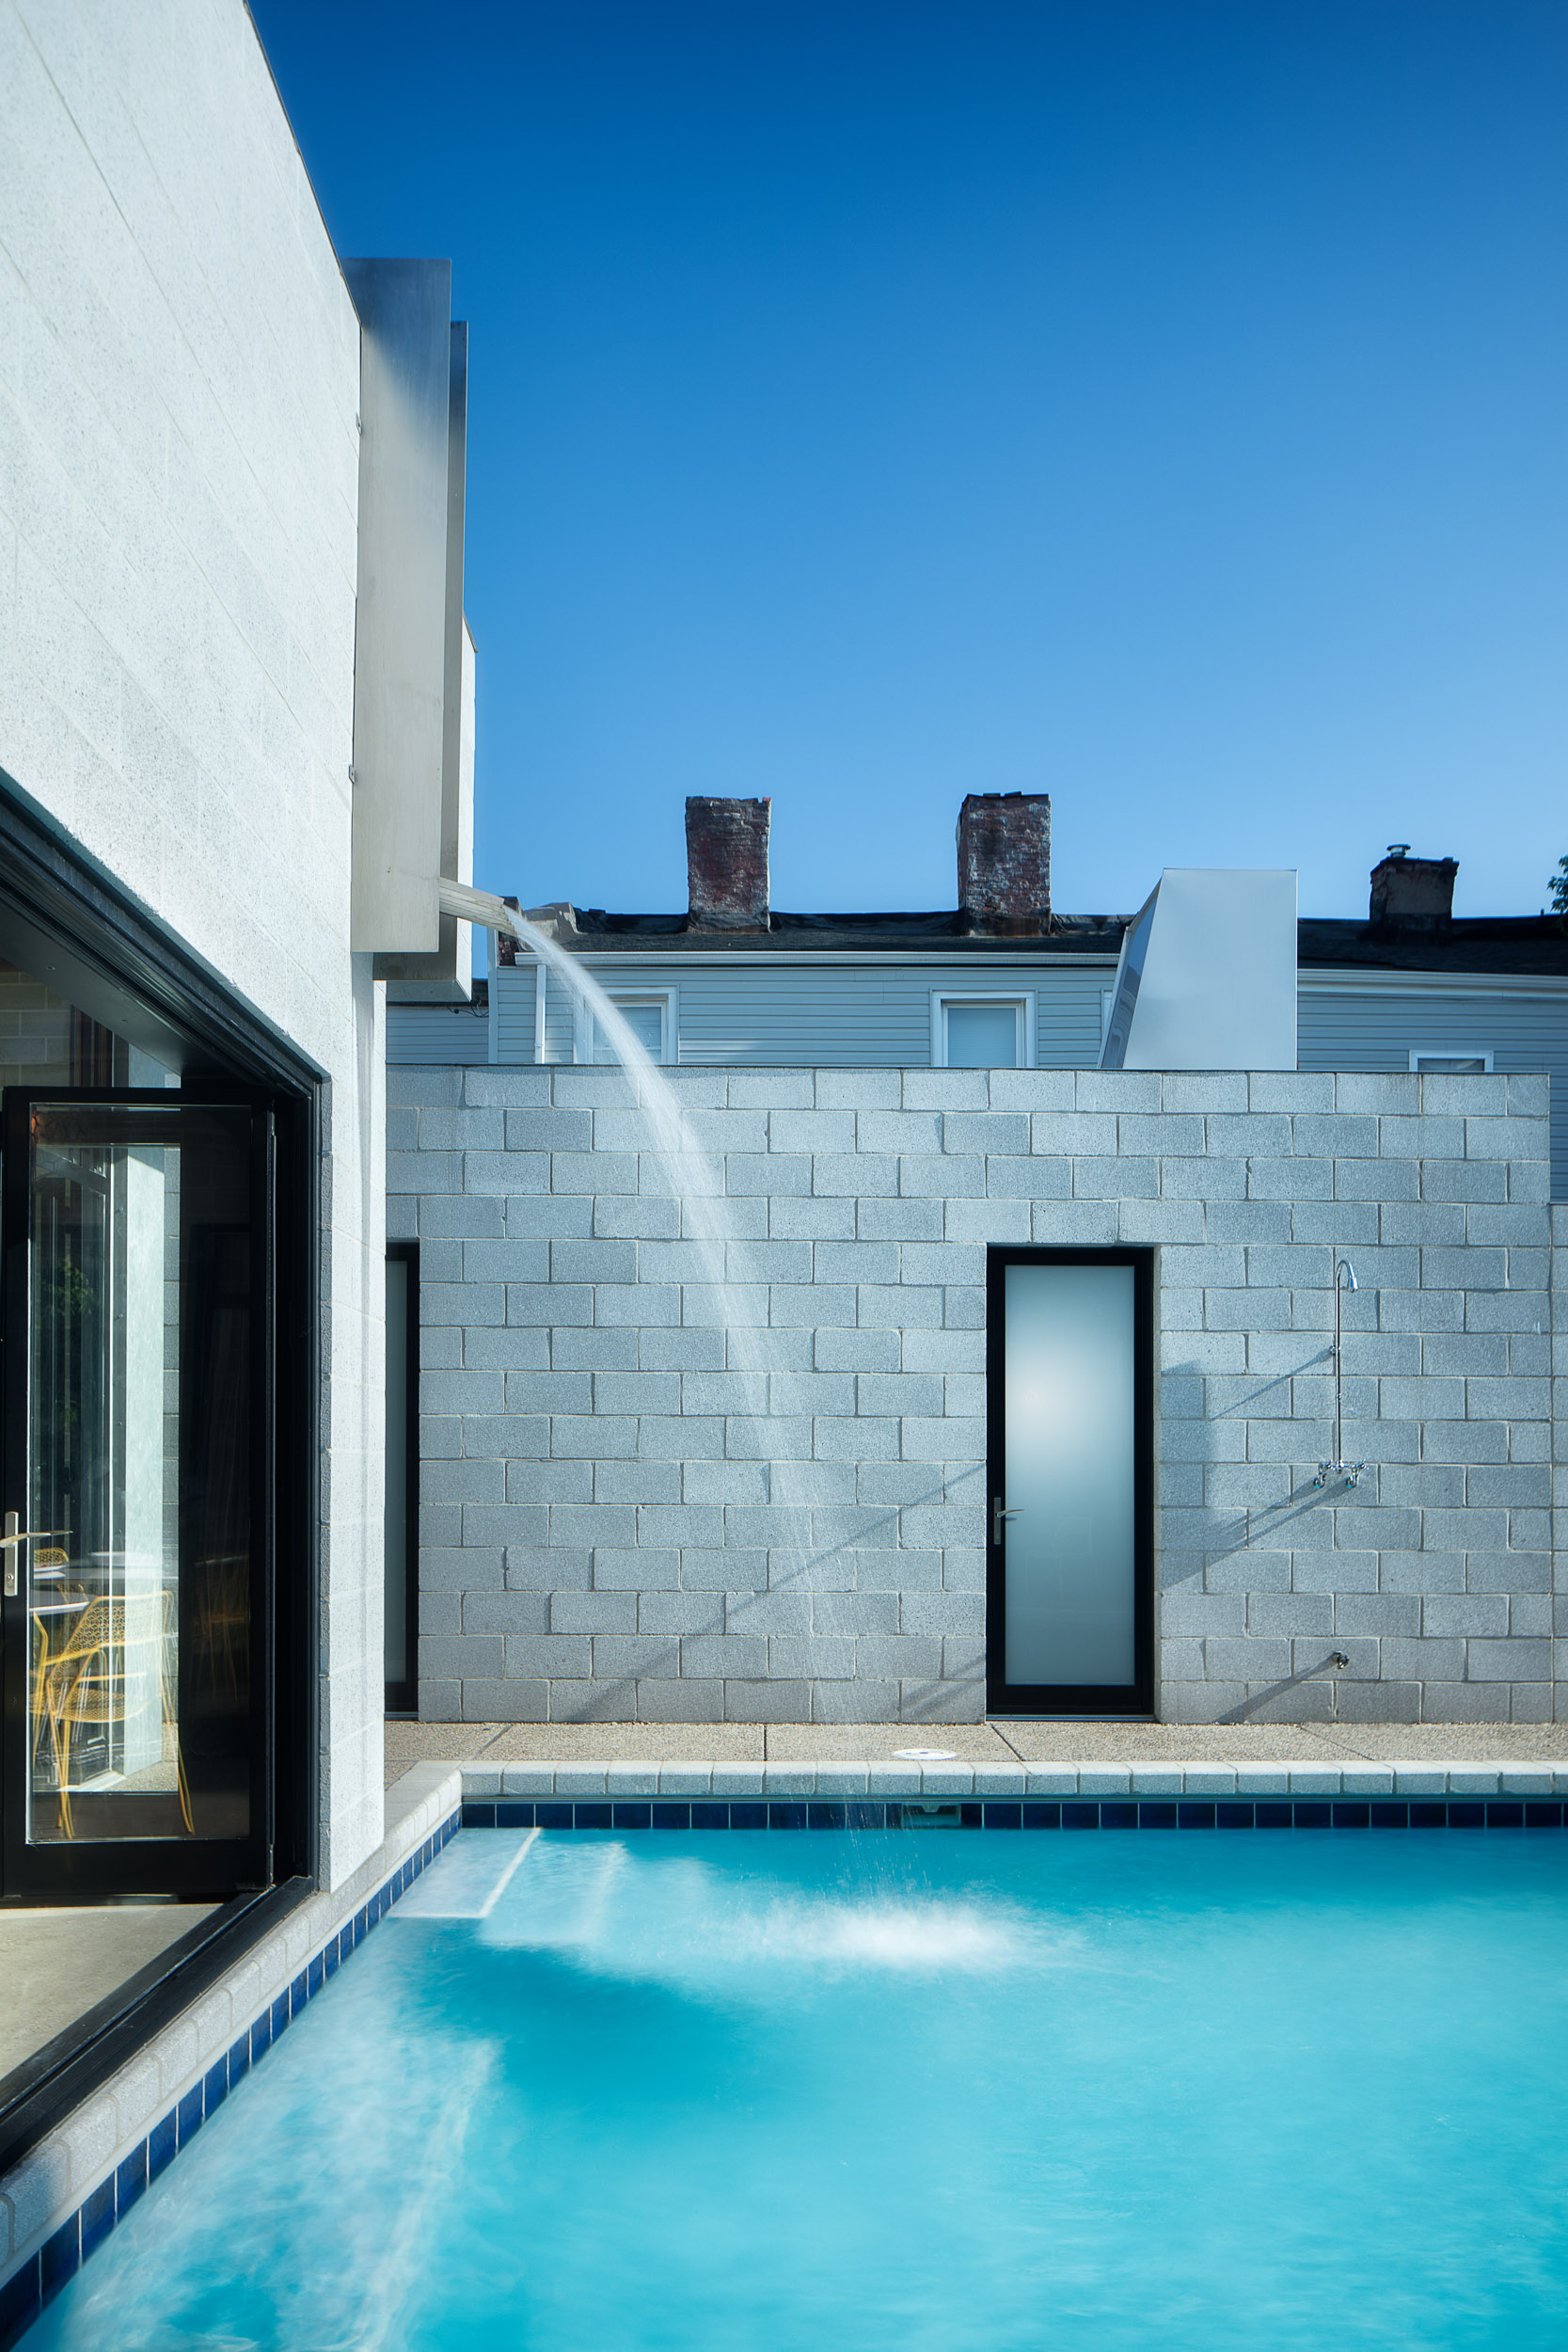 pool_pavilion_pittsburgh_design_poolhouse-10.jpg